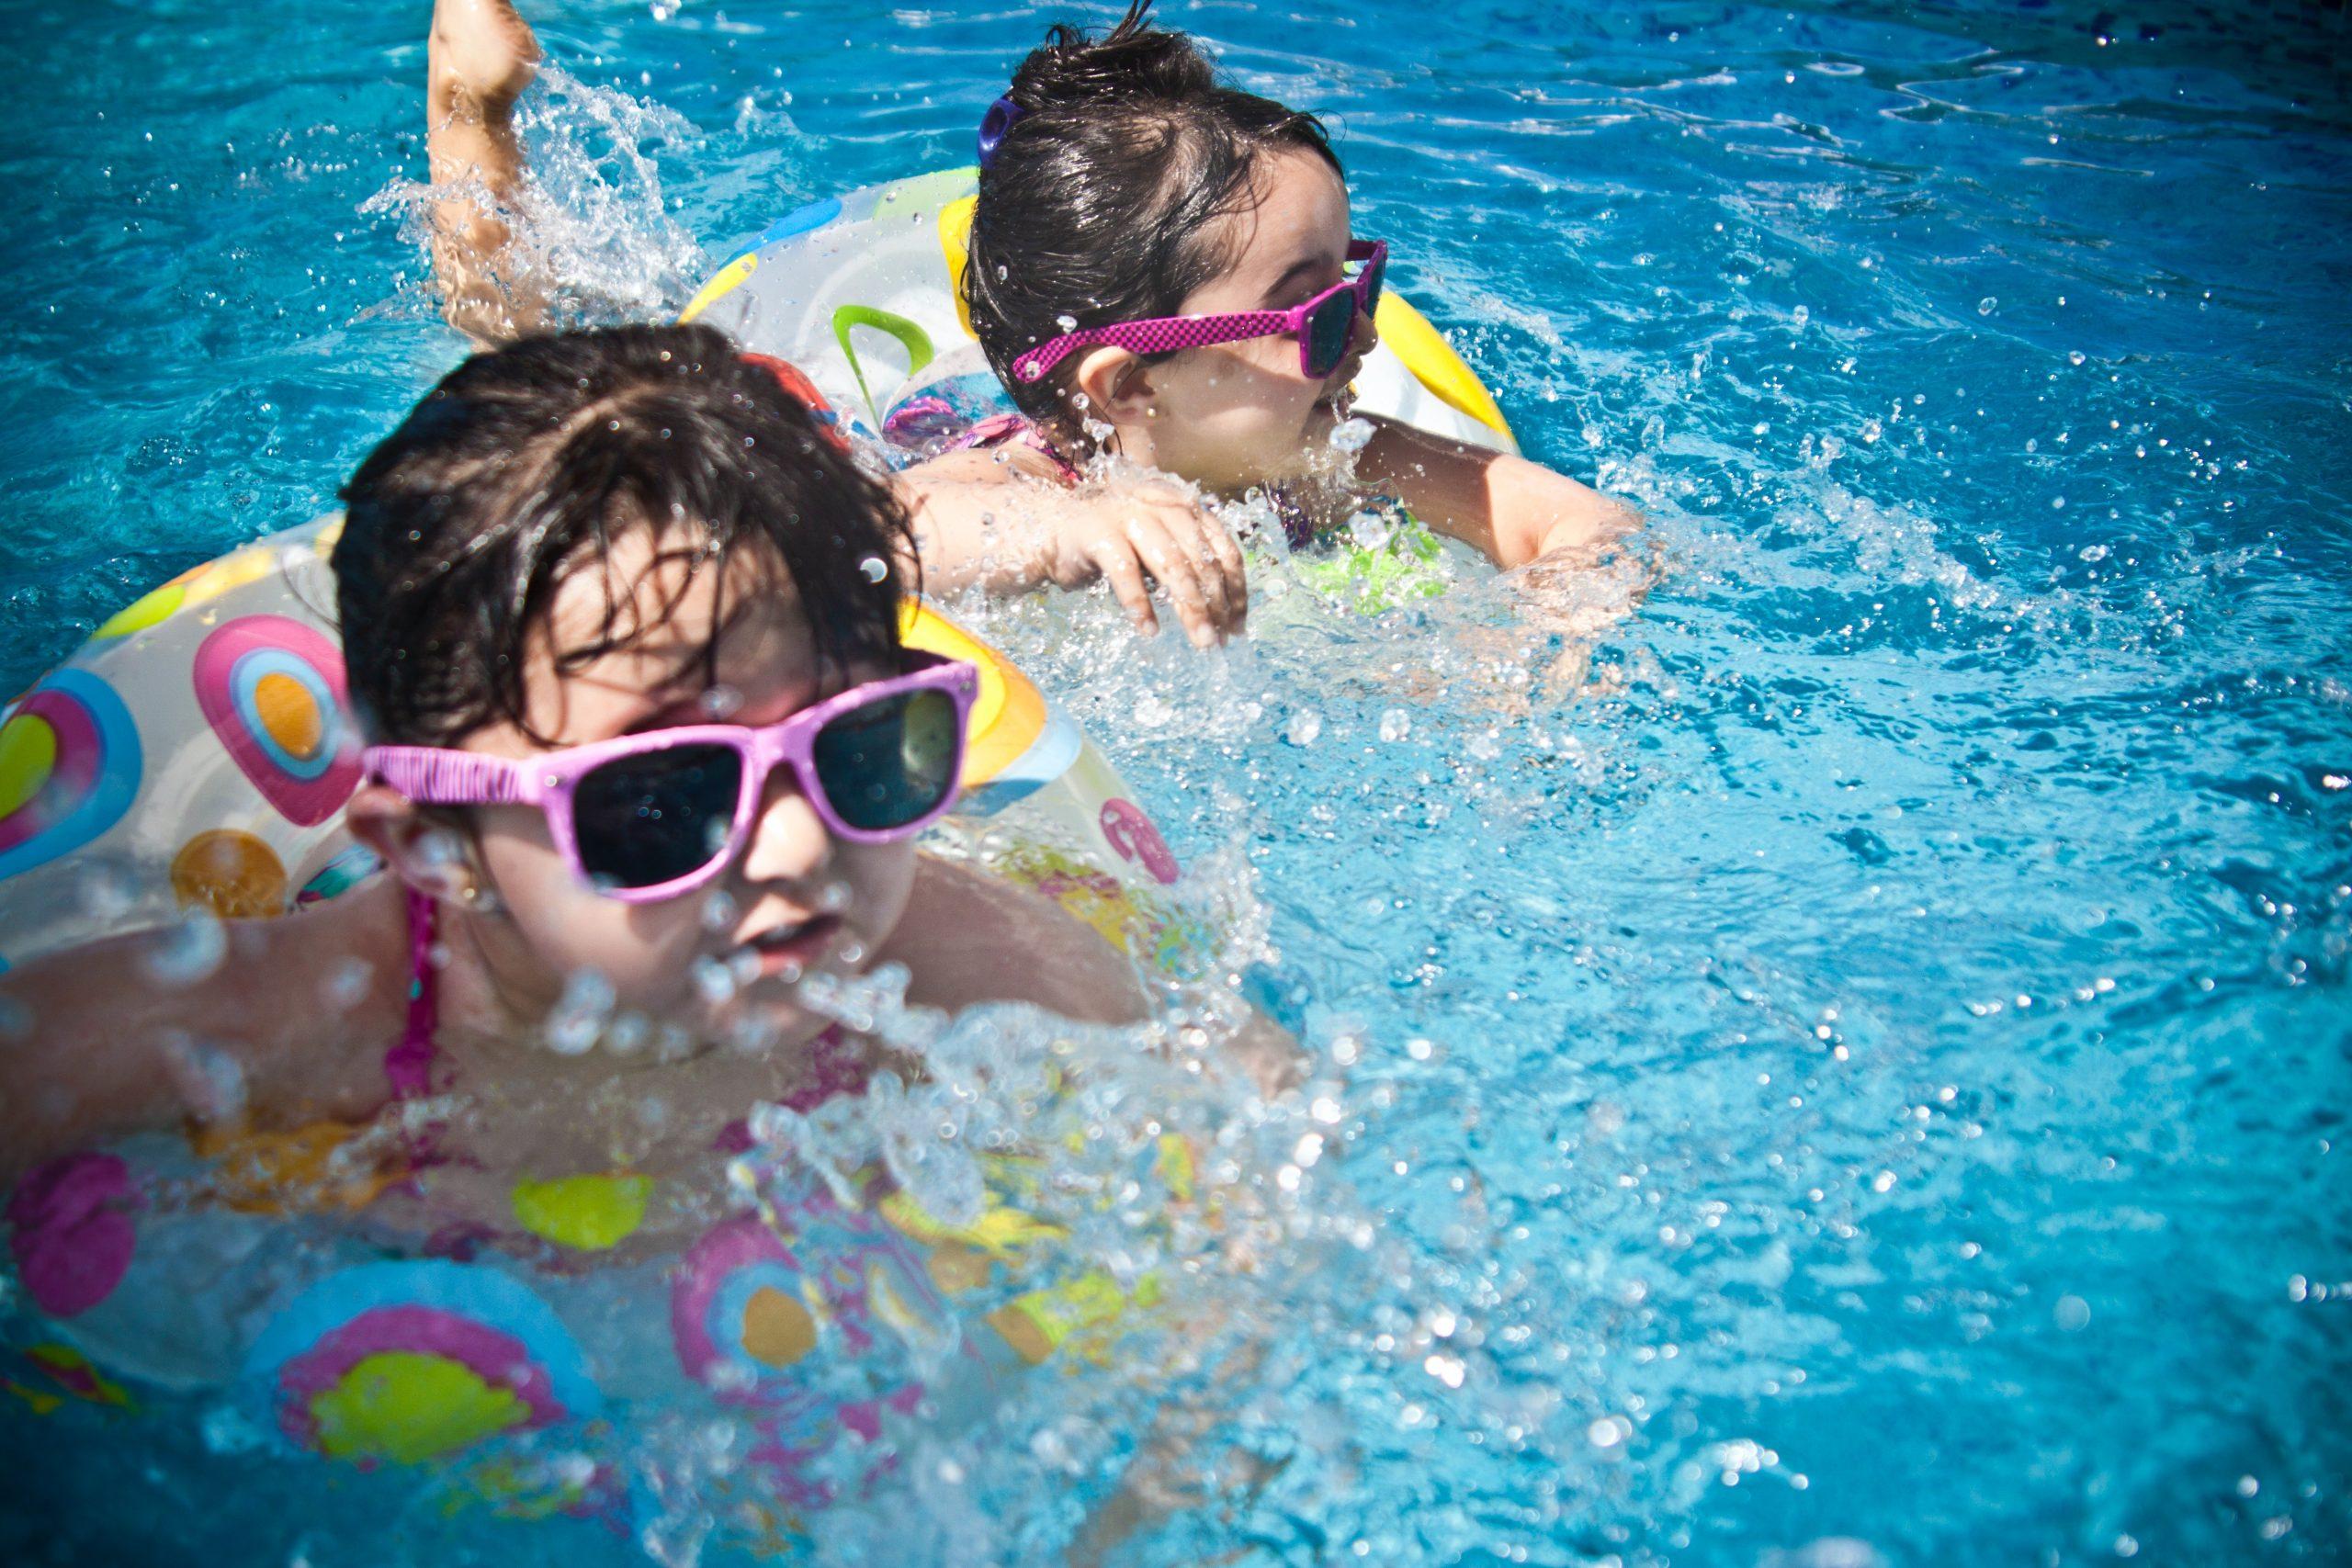 Girls swimming: Iowa City area pools and splash pads